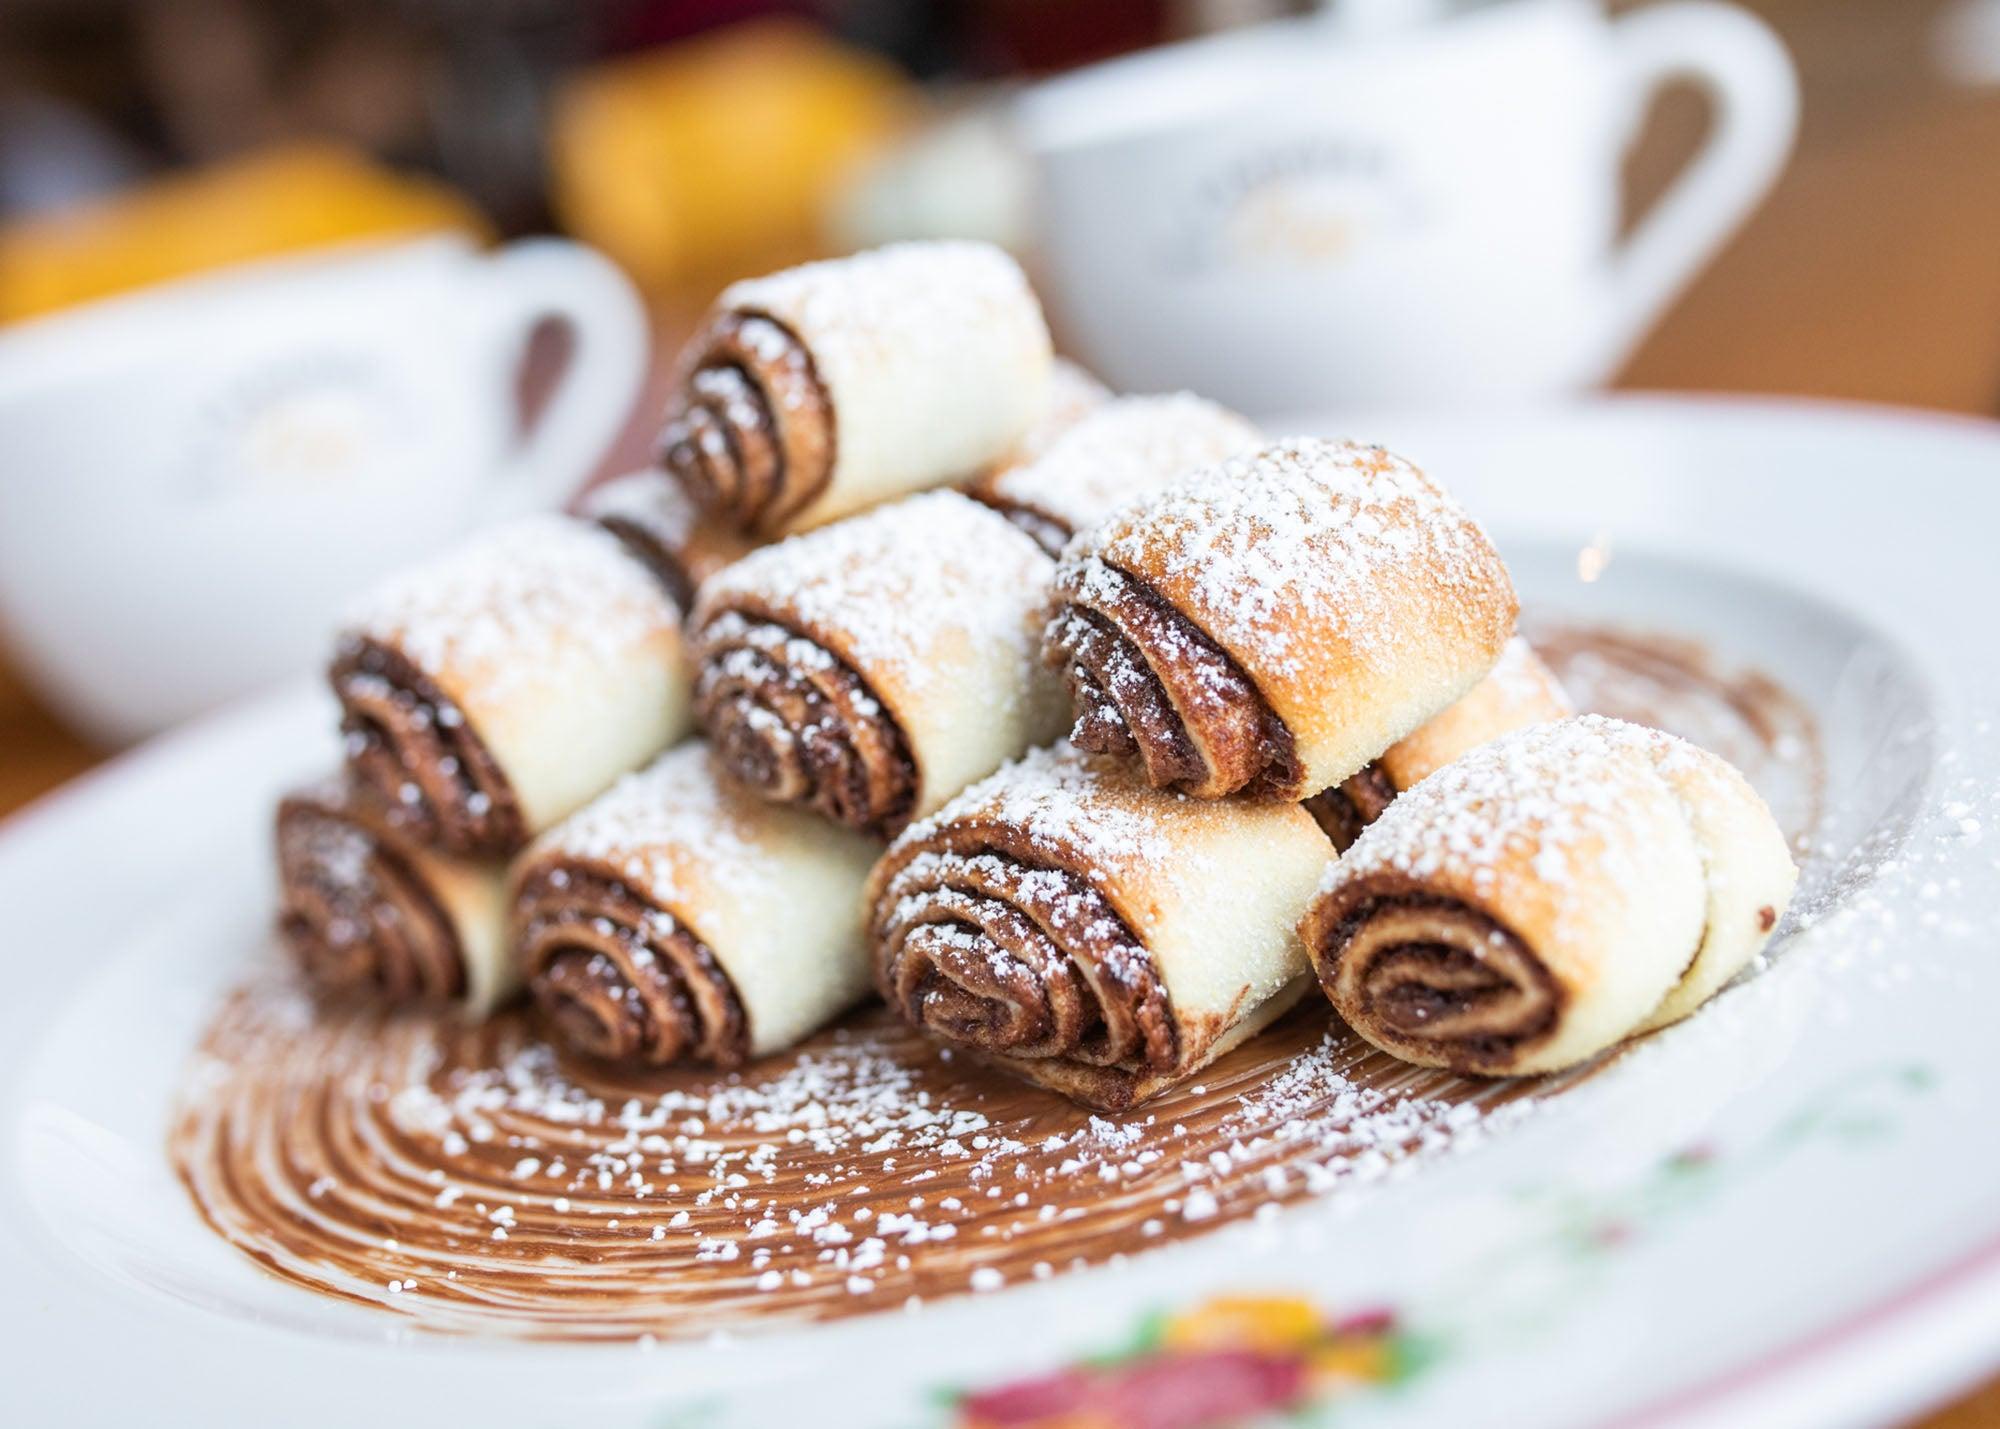 Nutella rozalach at Cafe Landwer